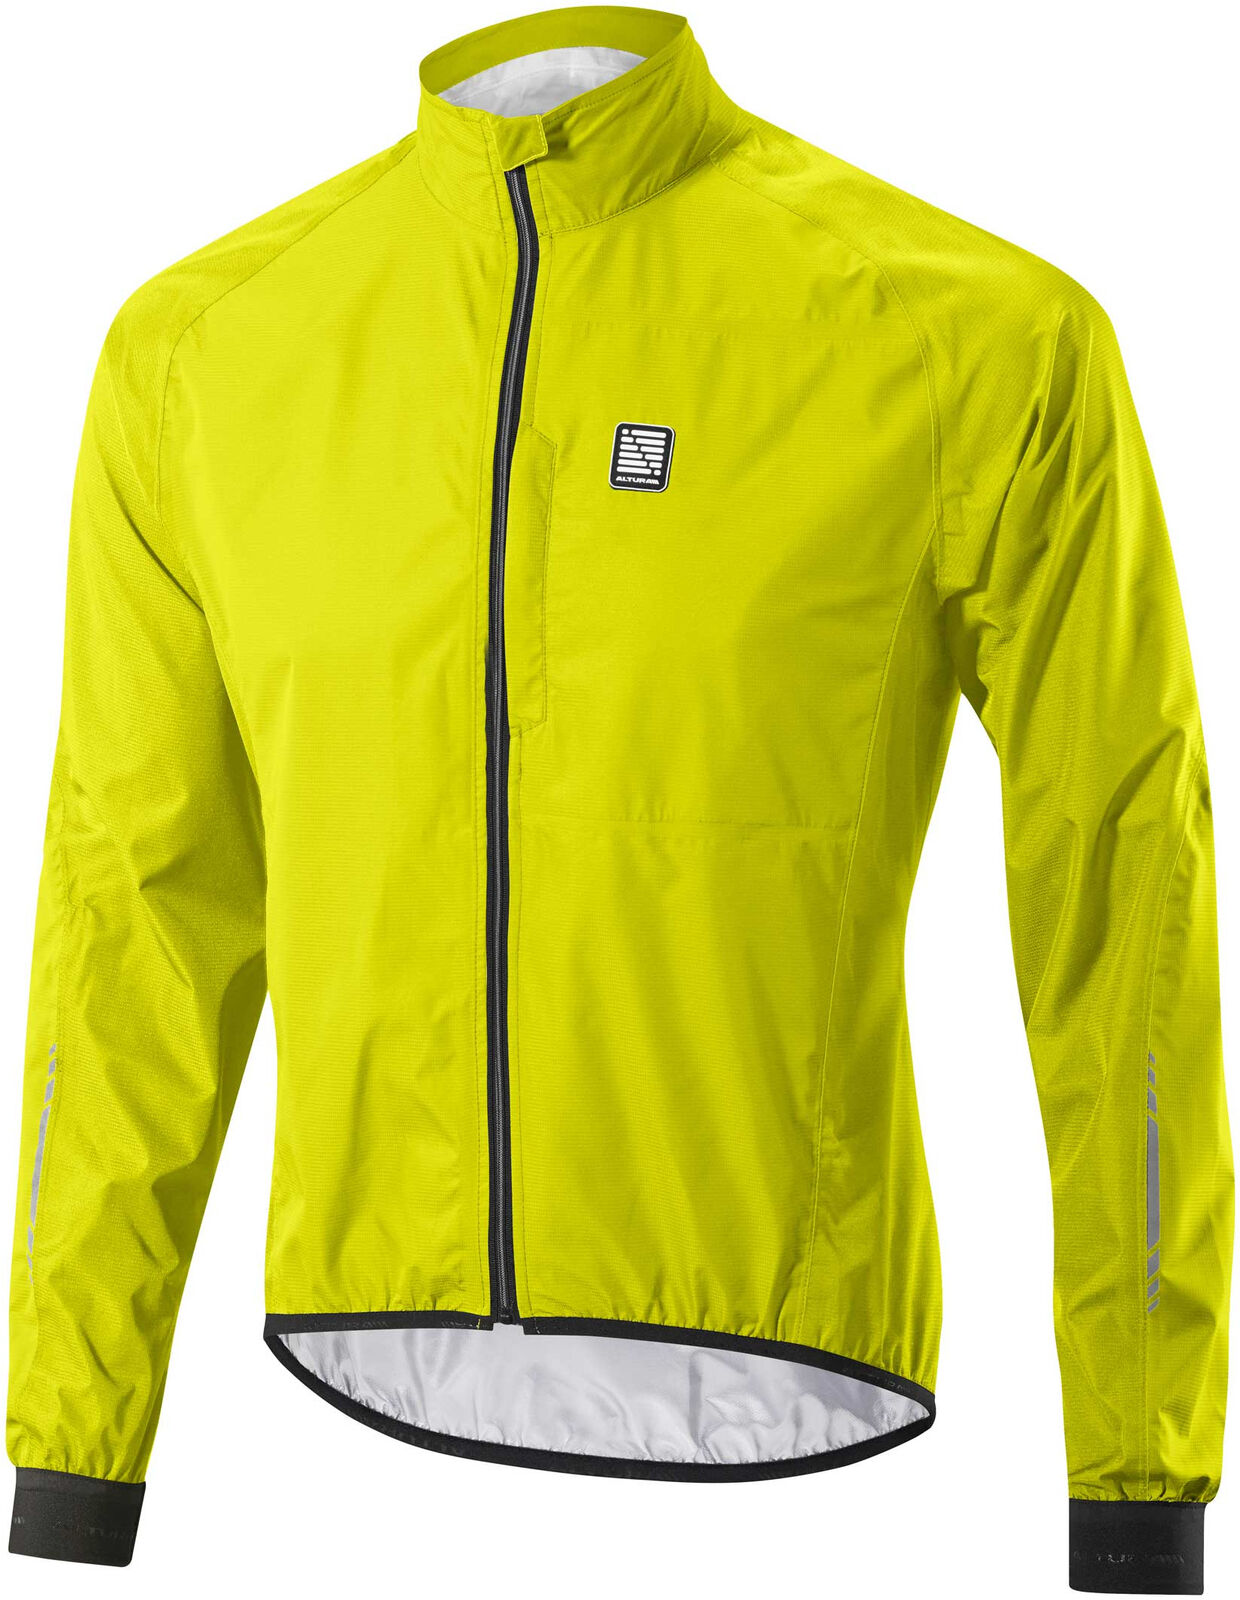 Altura GRUPPO impermeabile Ciclismo giacca da uomo-Giallo